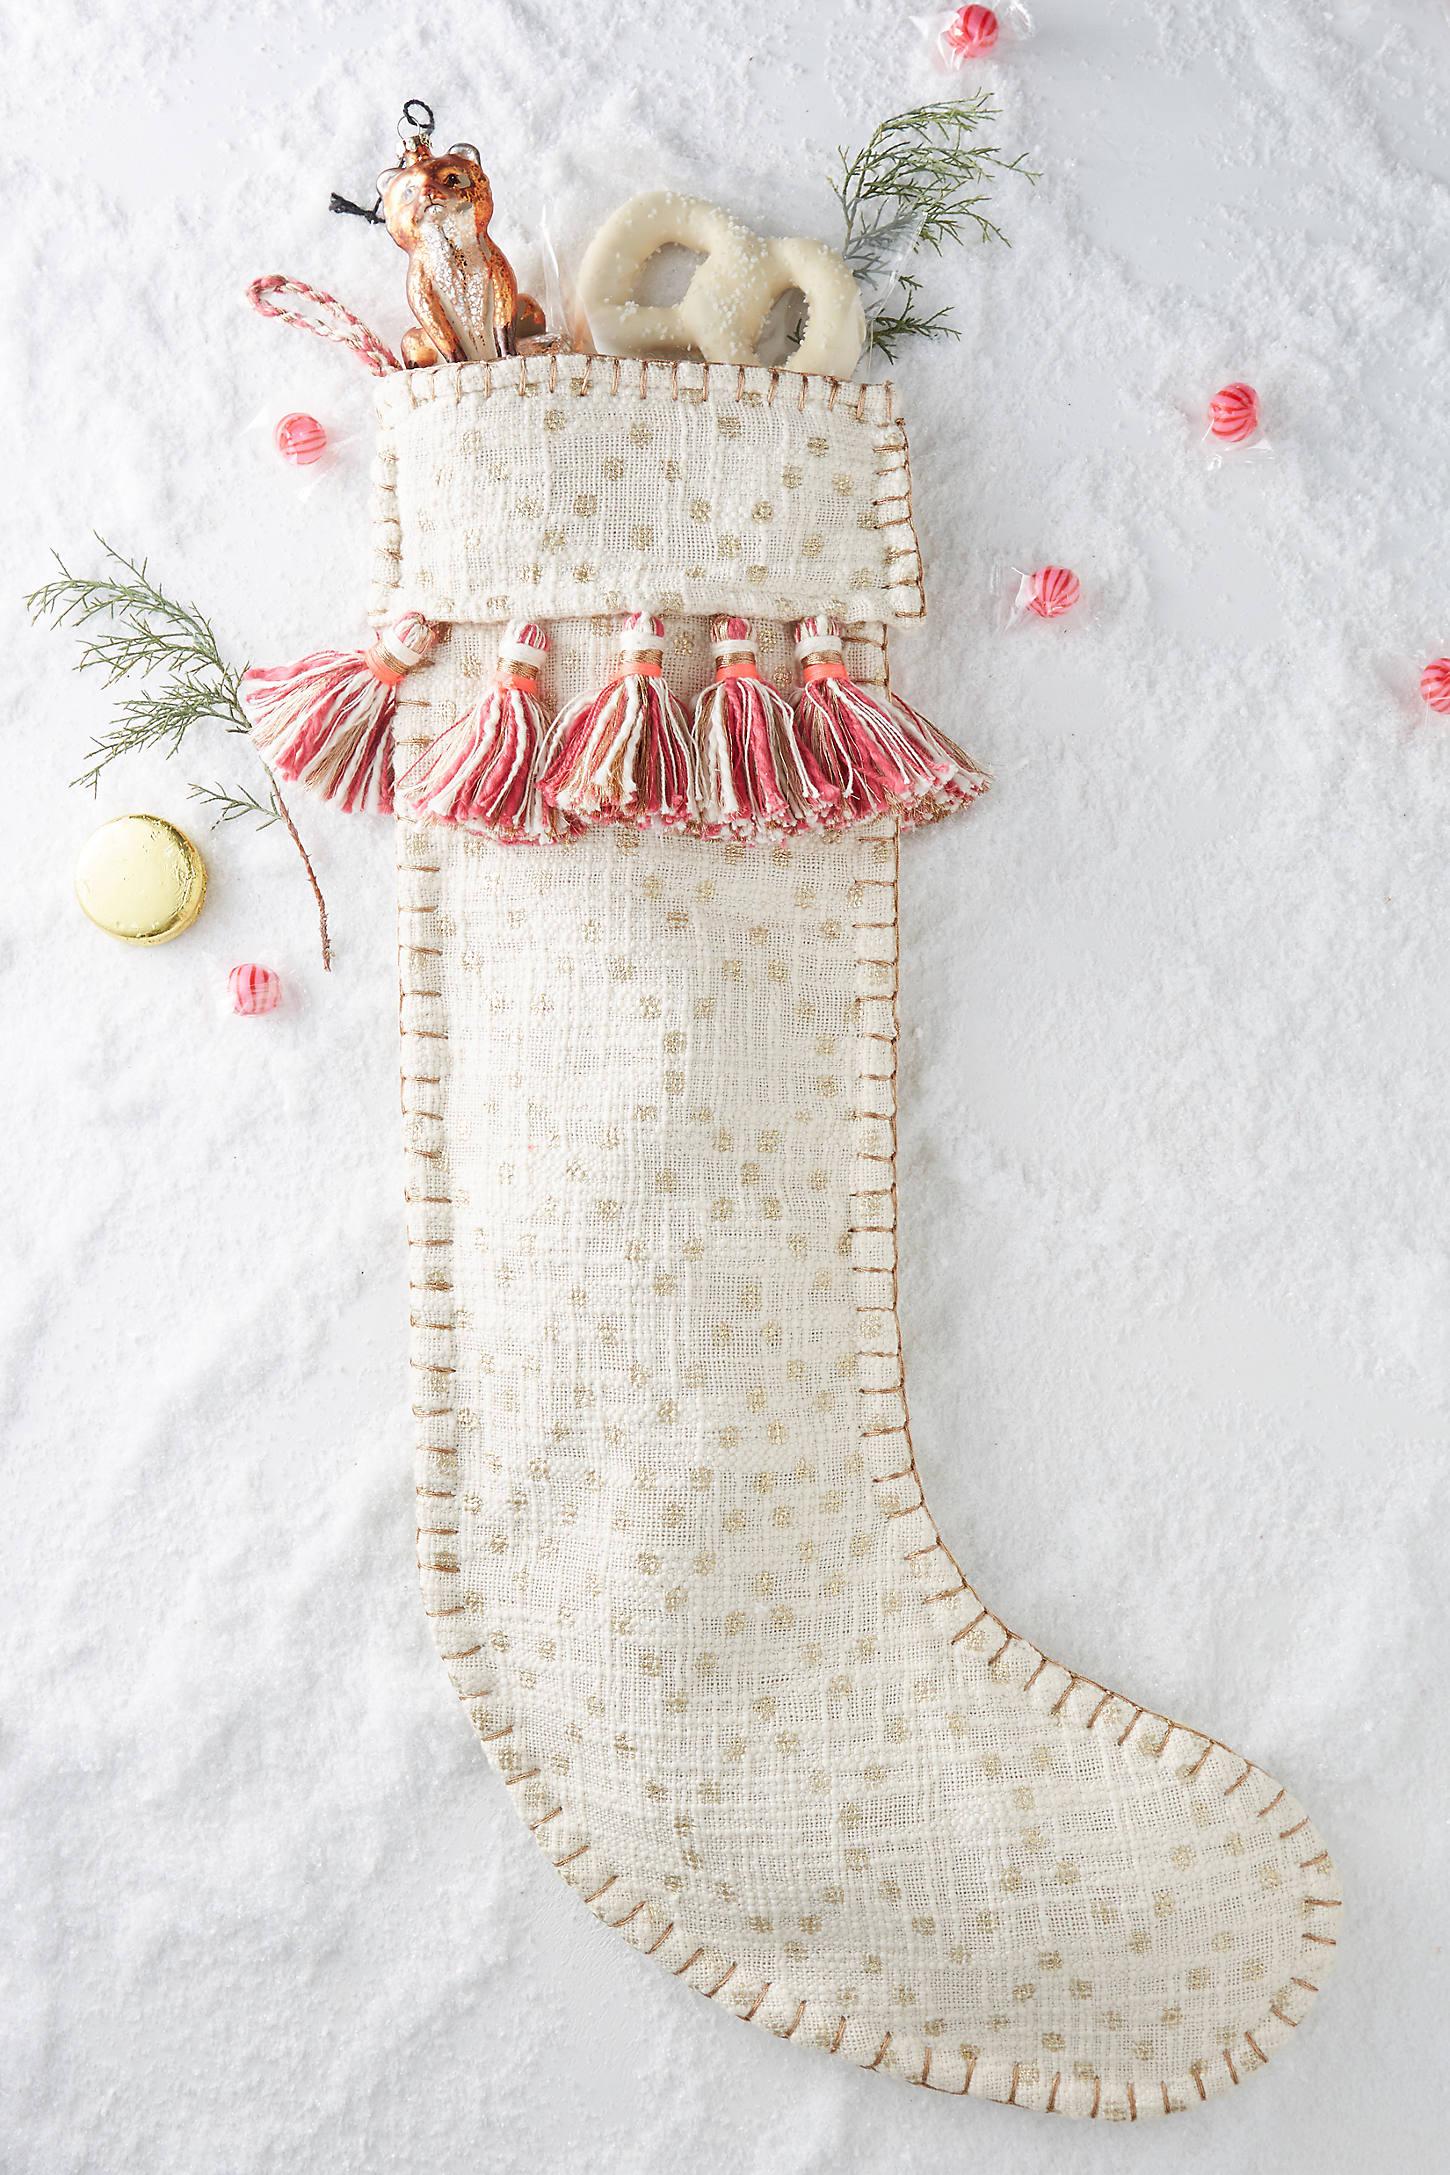 Tasselled Christmas Stocking